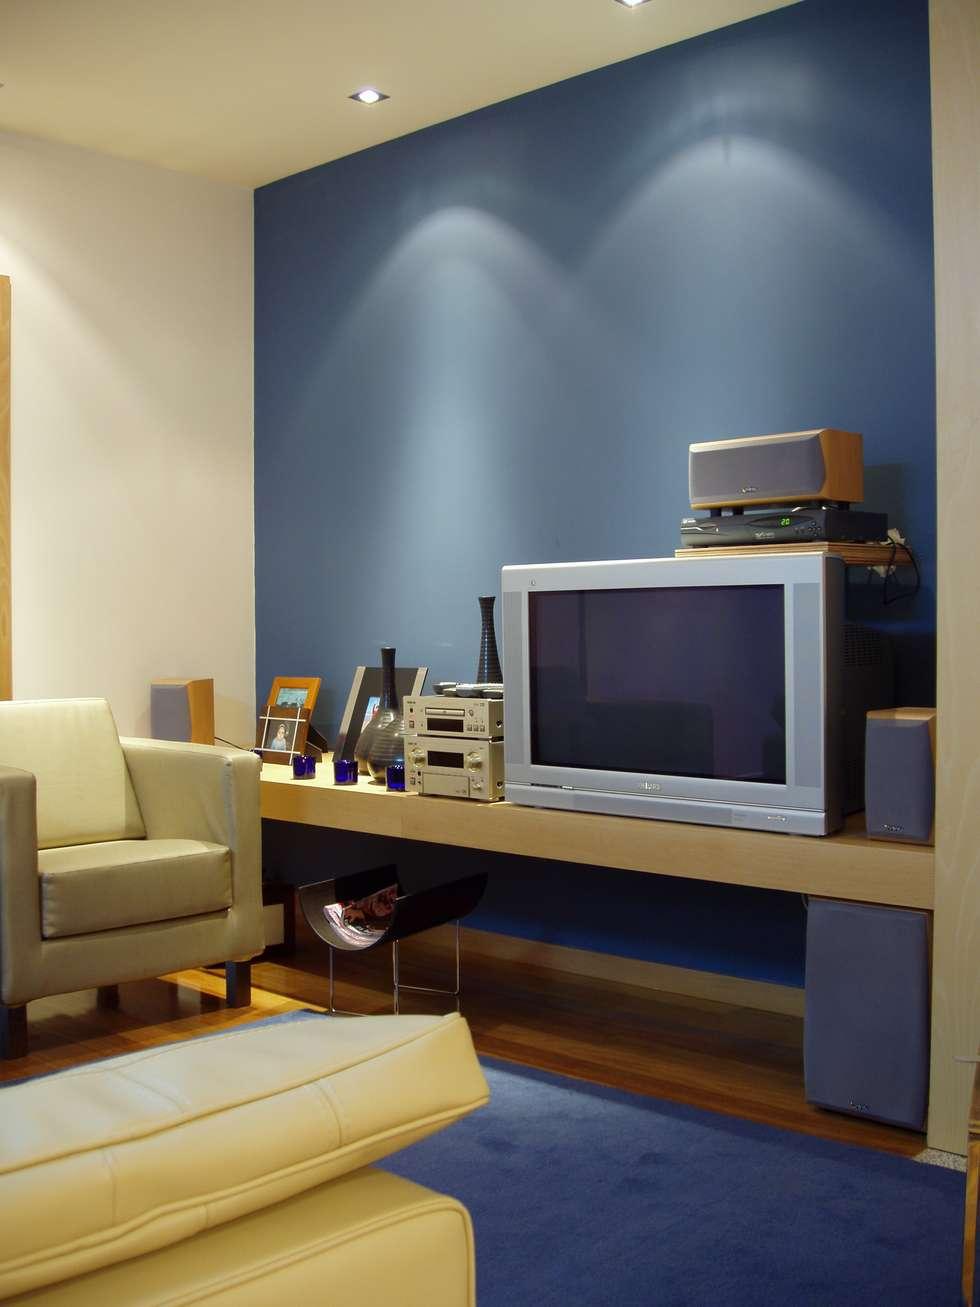 Sala: Salas de estar modernas por Inexistencia Lda